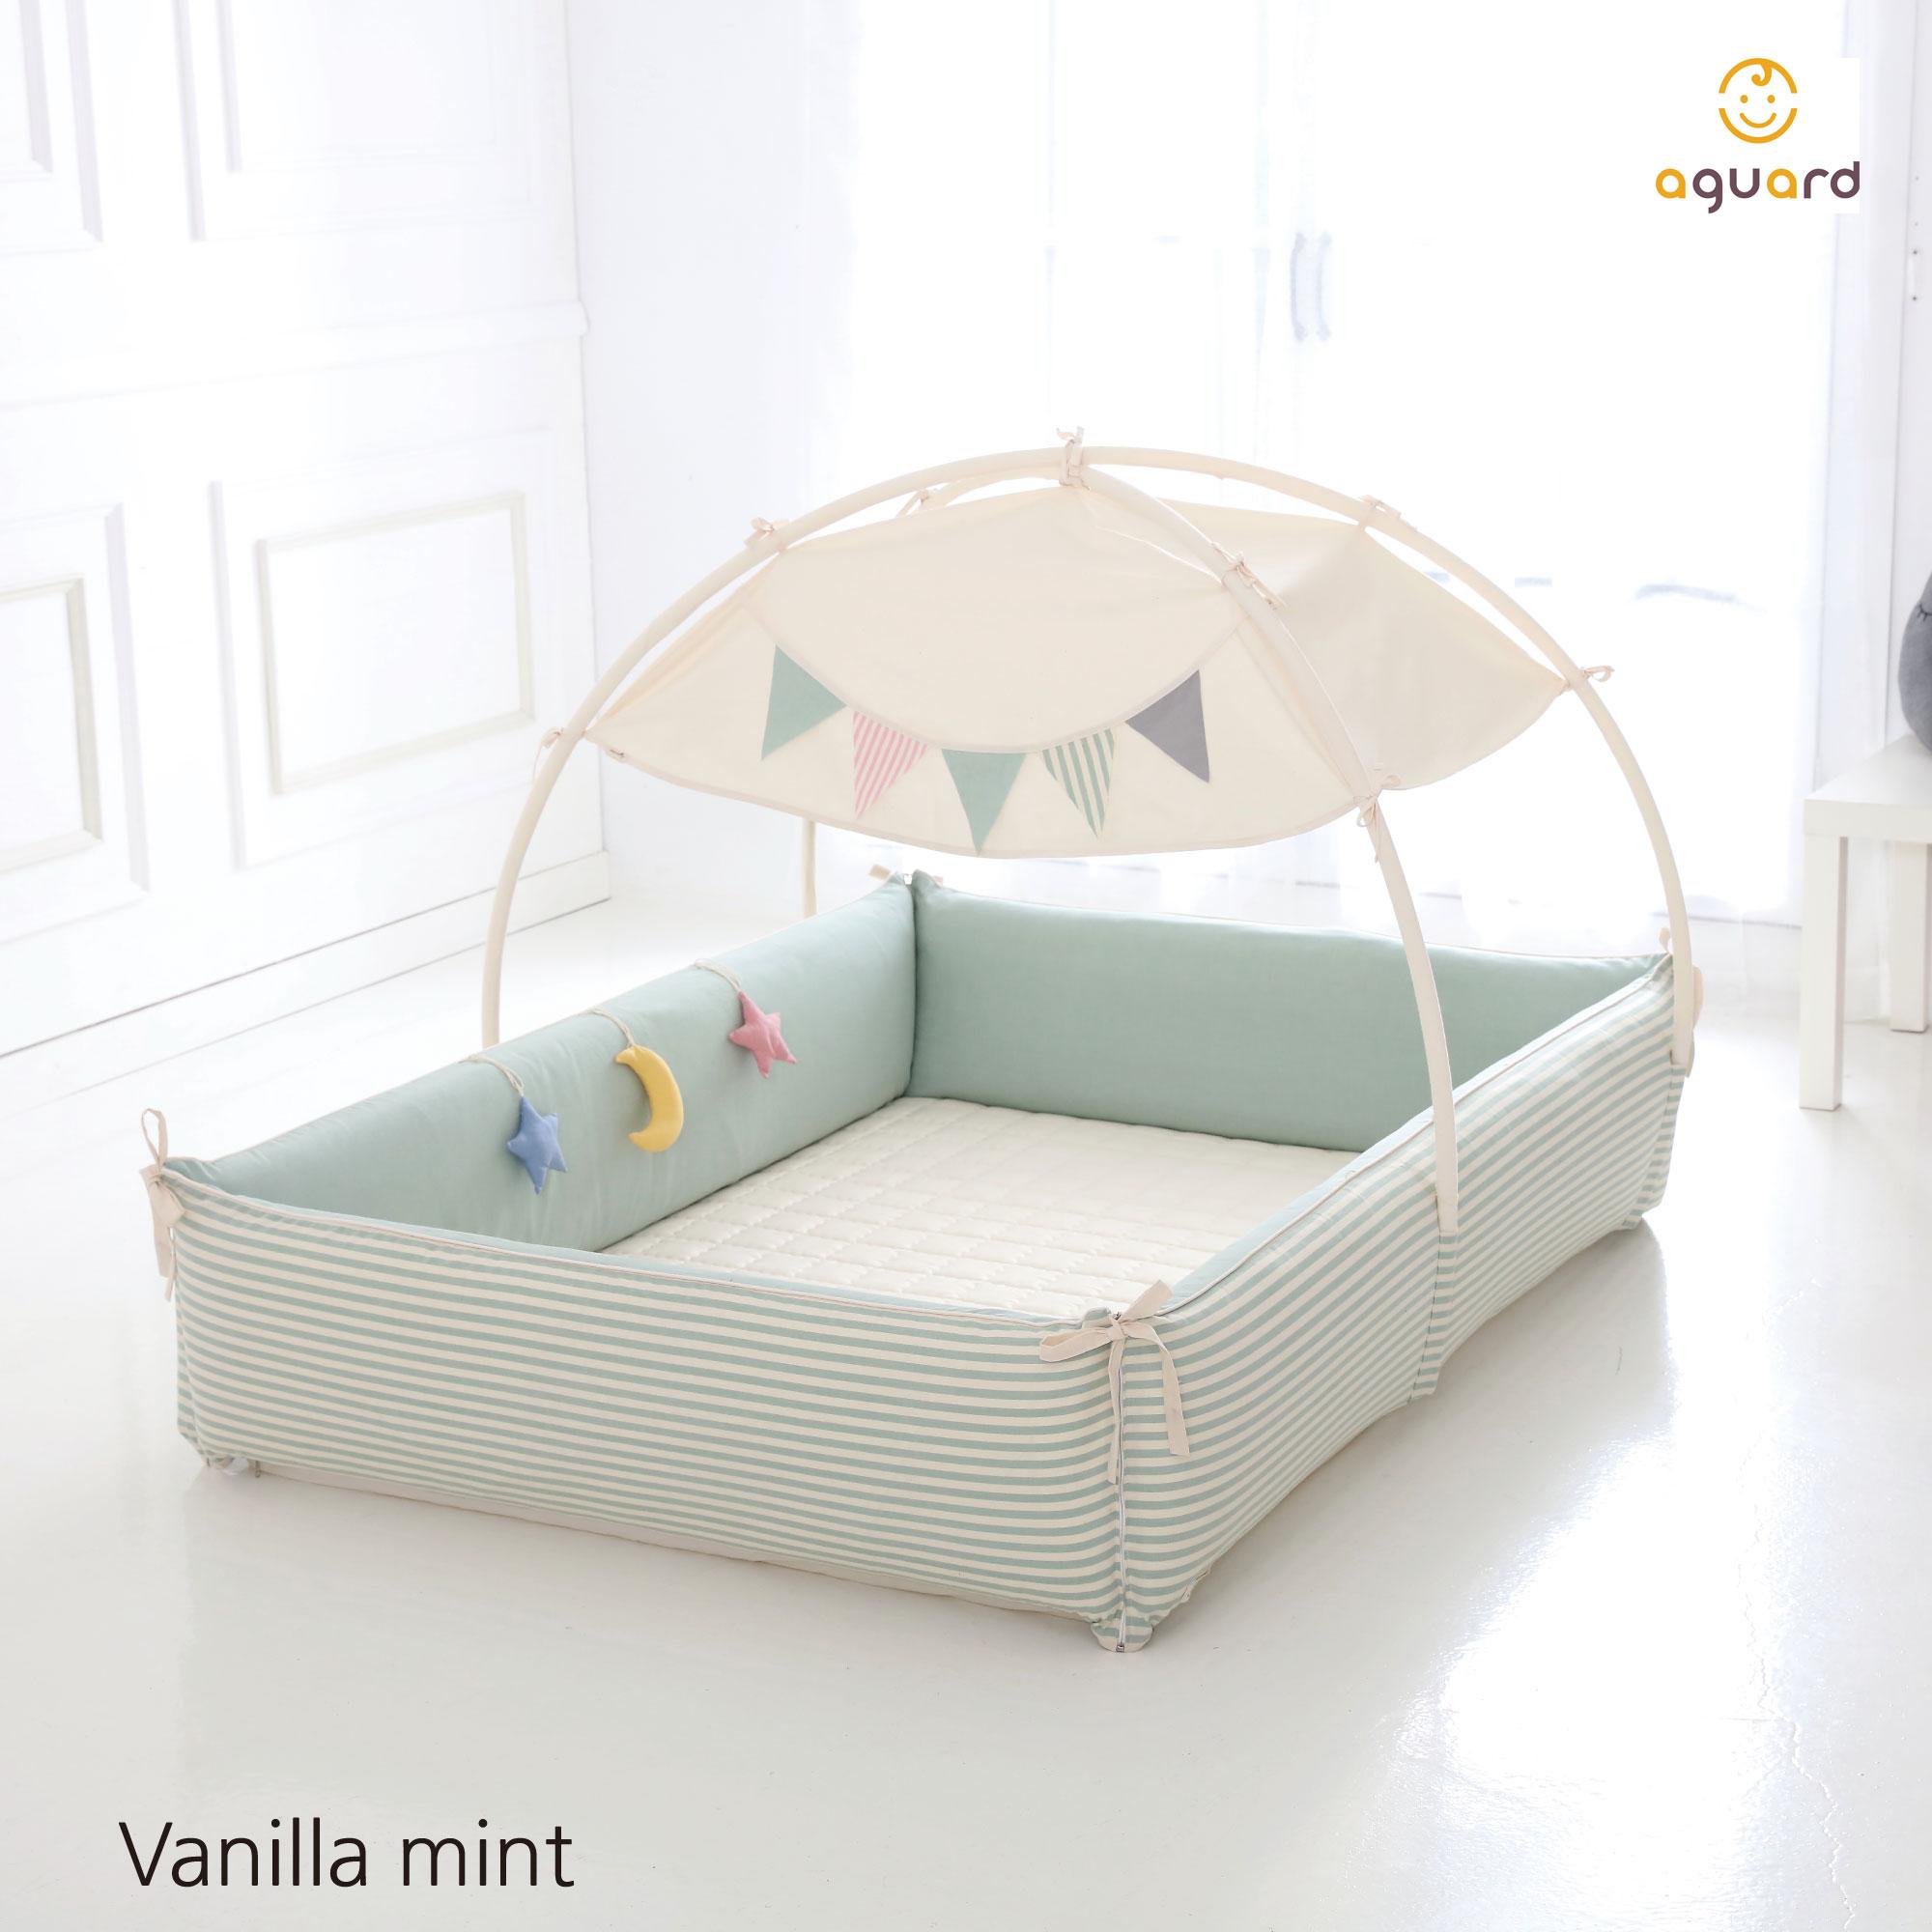 AGUARD Bumper Bed - Vanilla Mint - M |Mummy Bebe